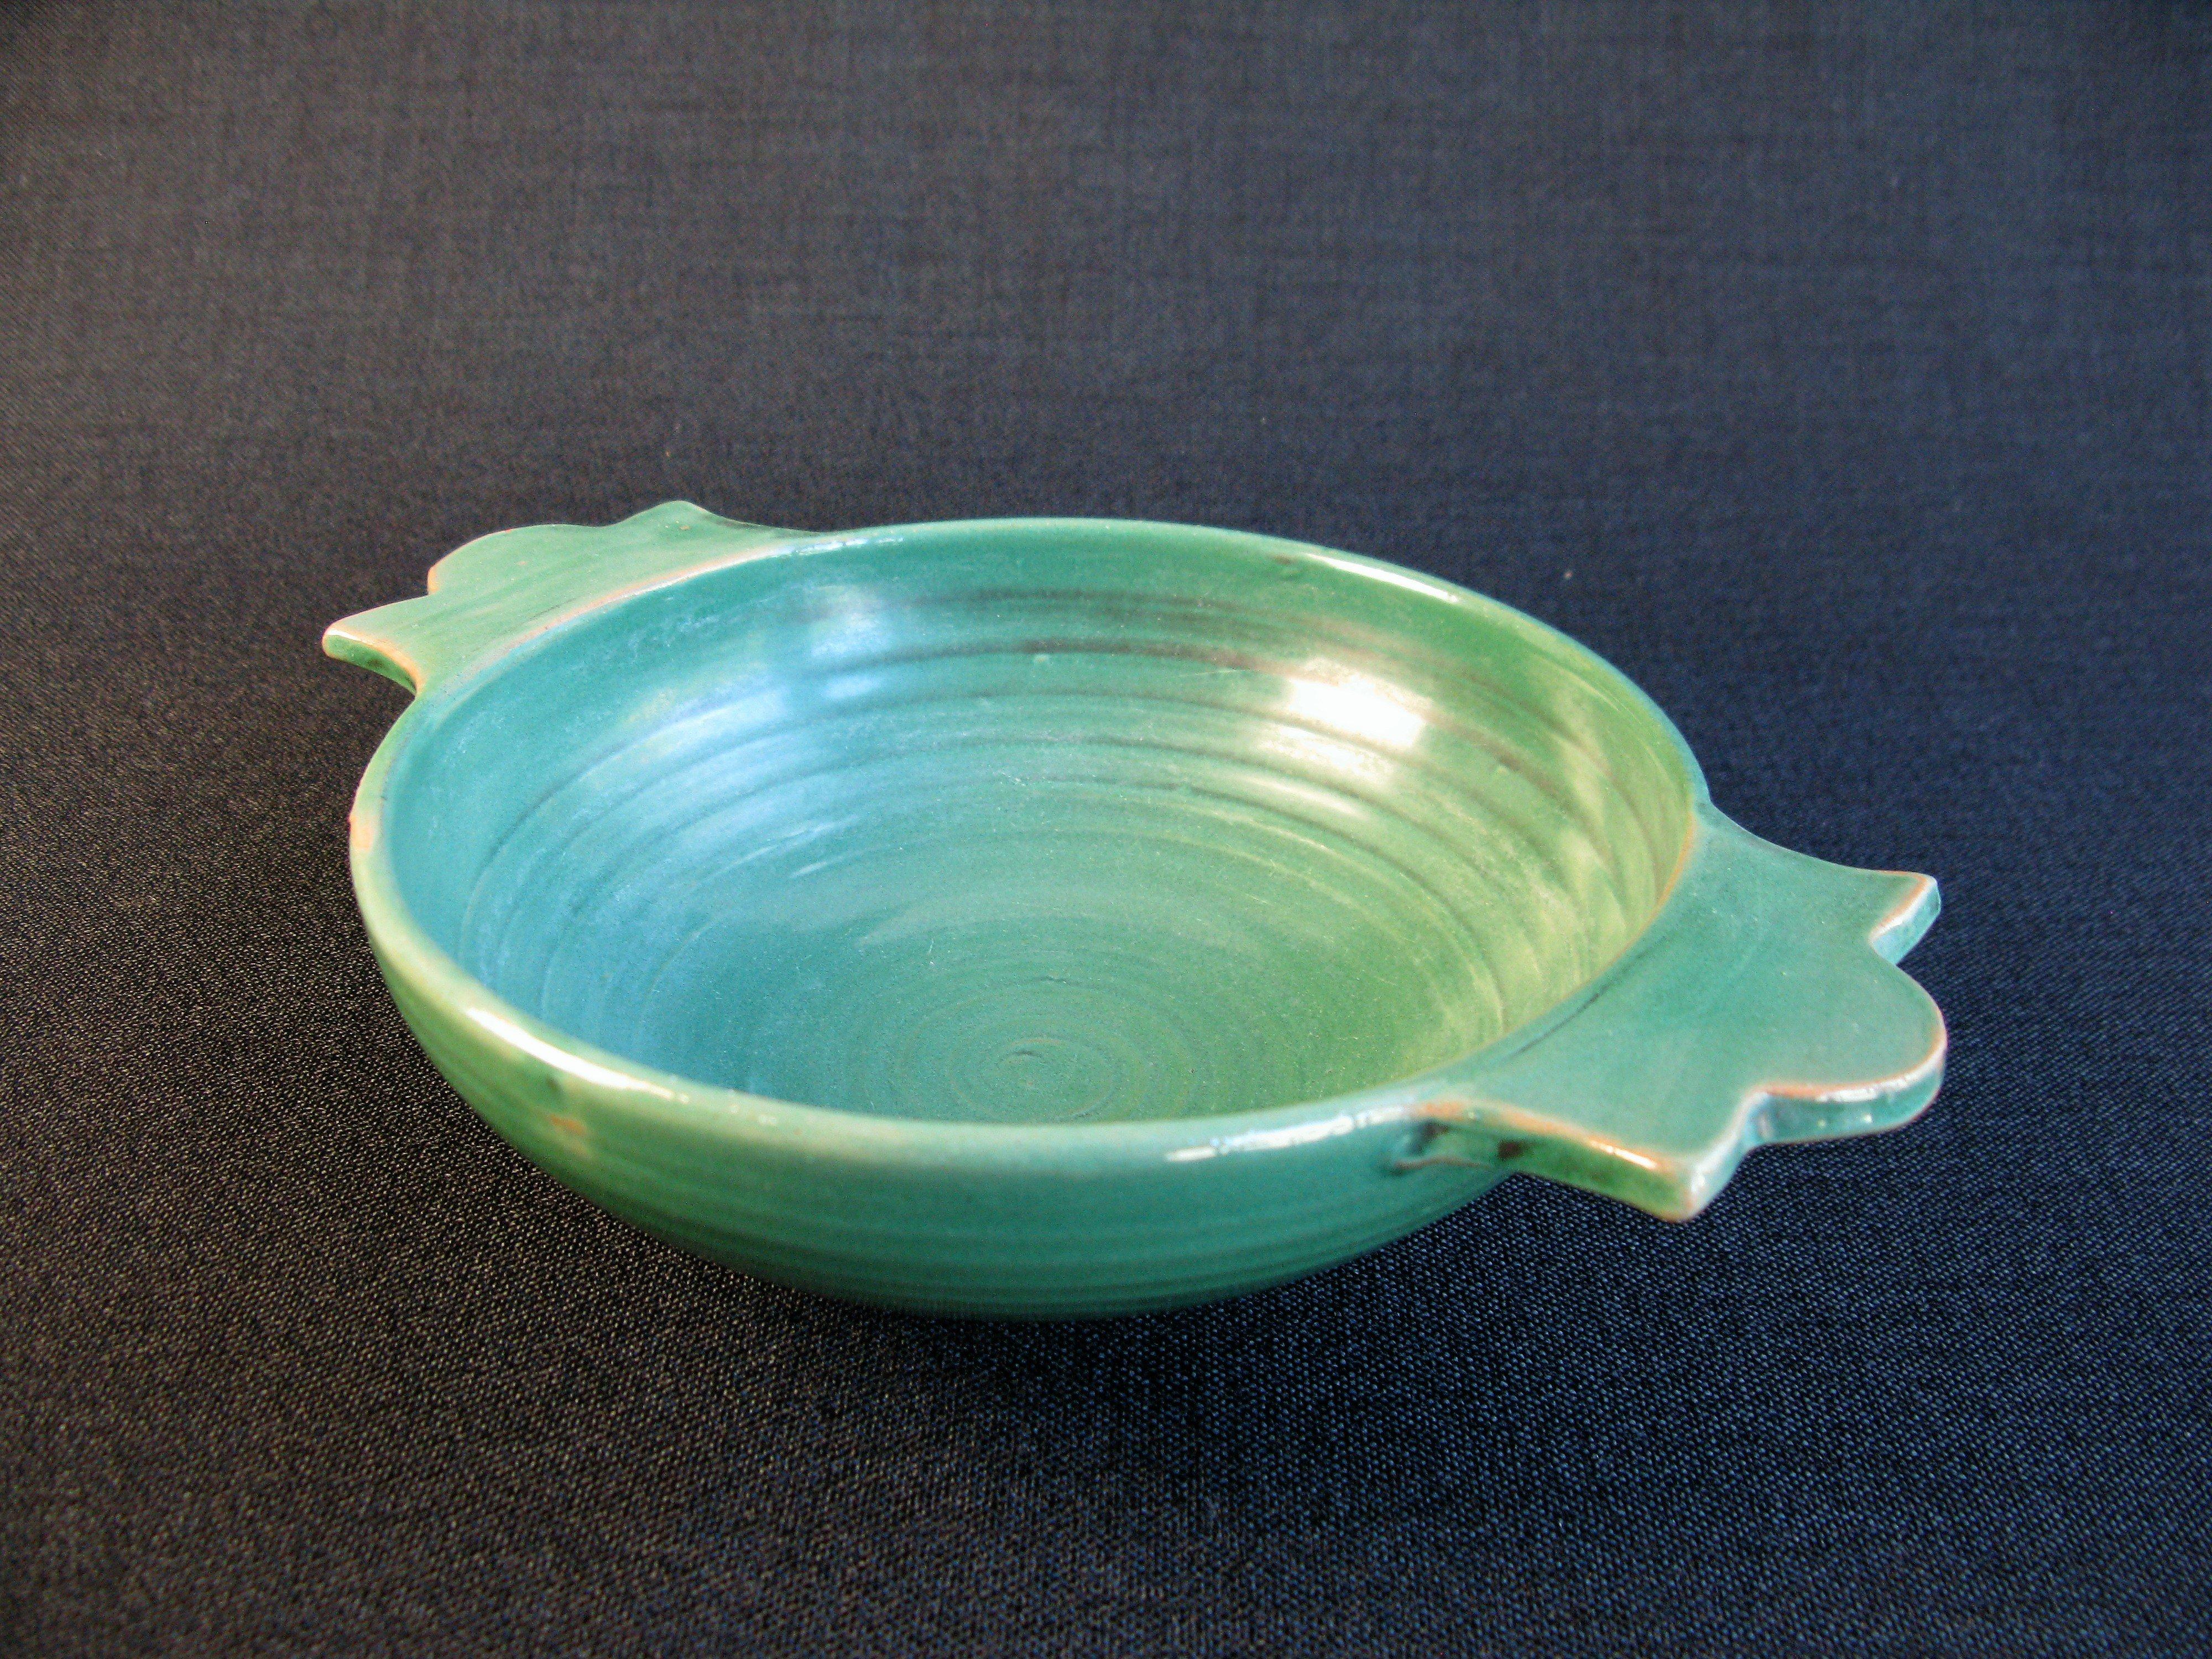 green bowl 2285